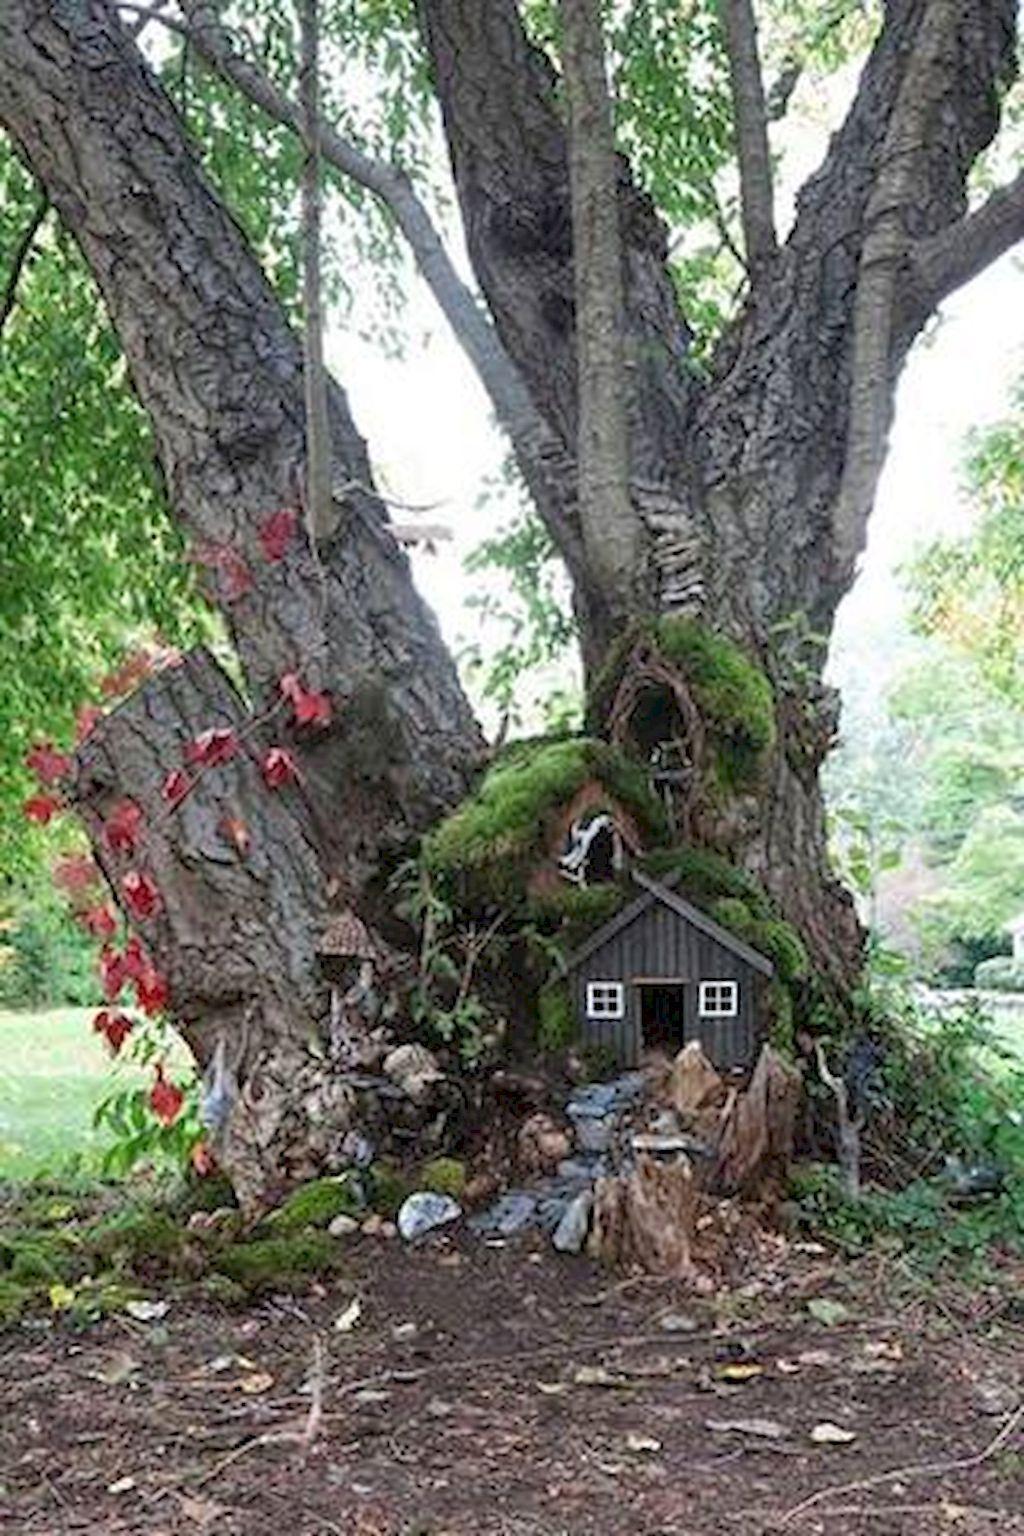 120 amazing backyard fairy garden ideas on a budget garden ideas